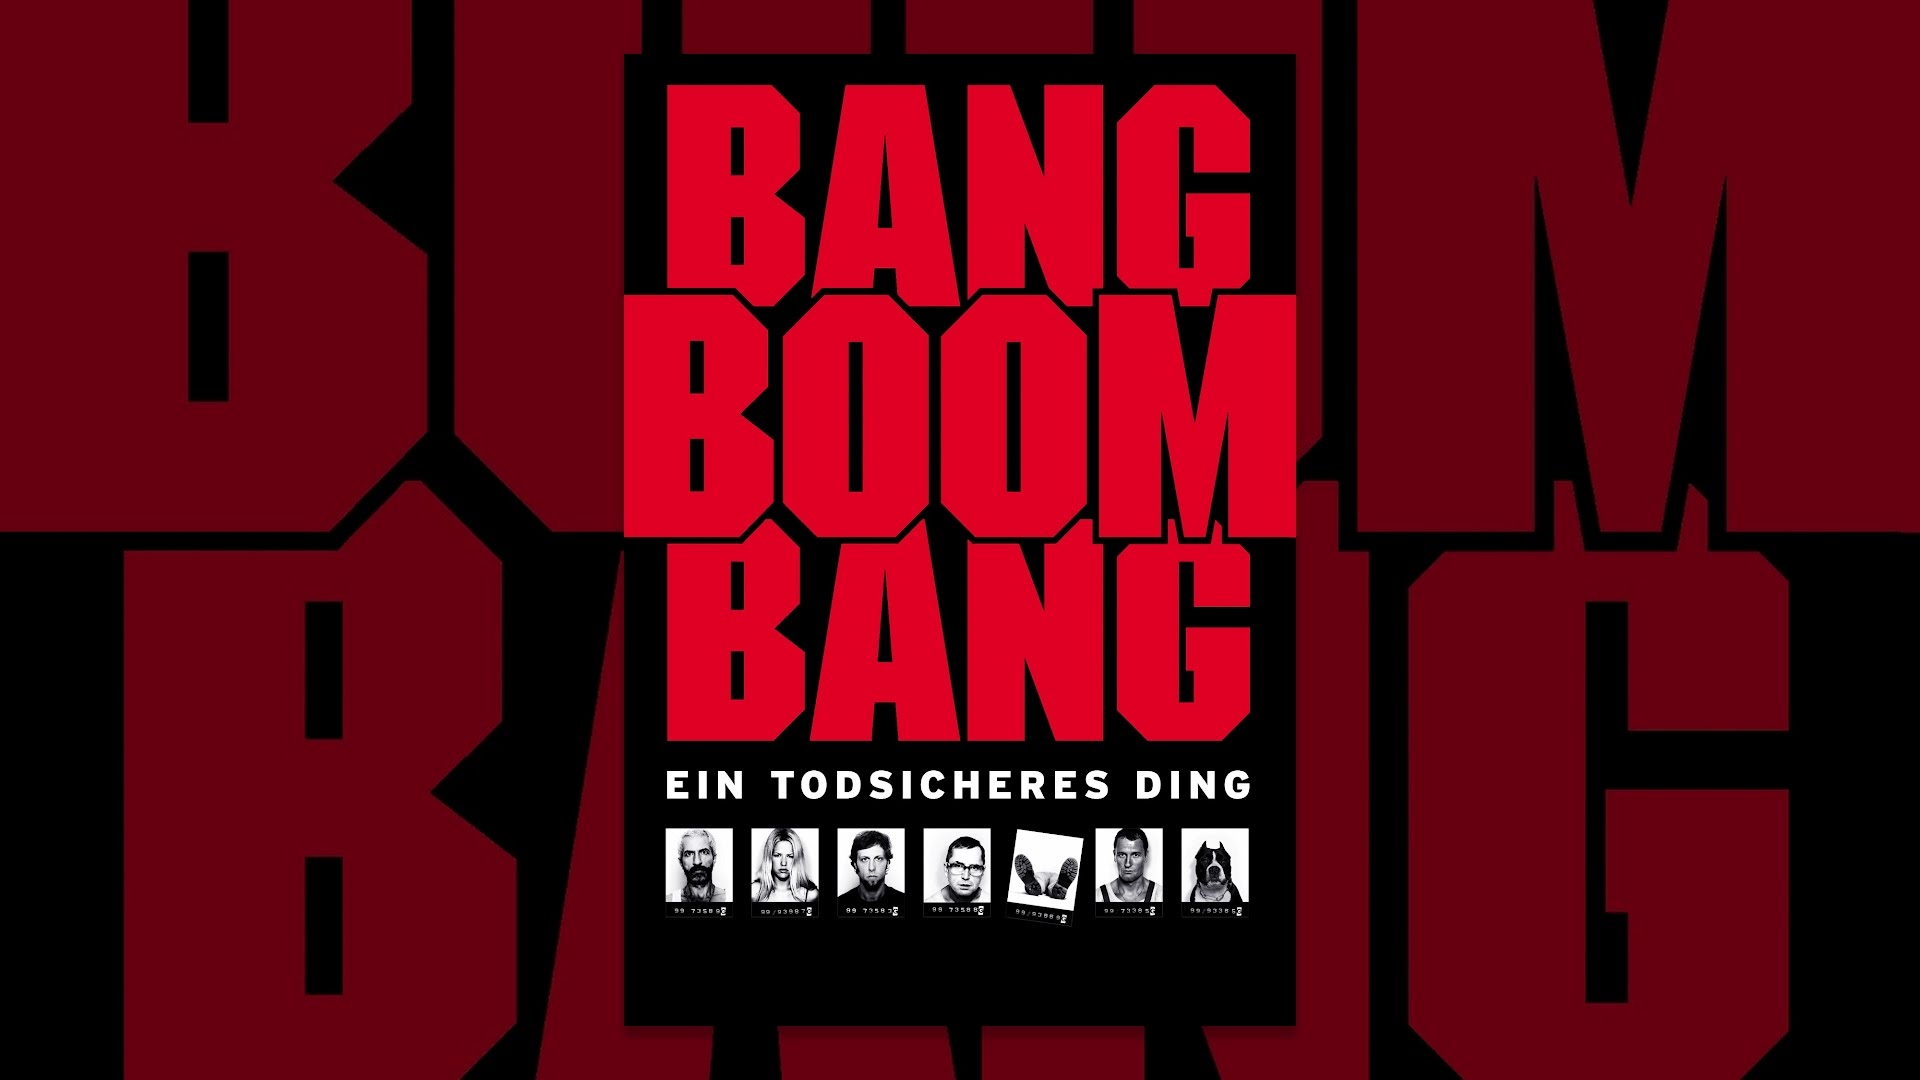 Bäng Boom Bäng